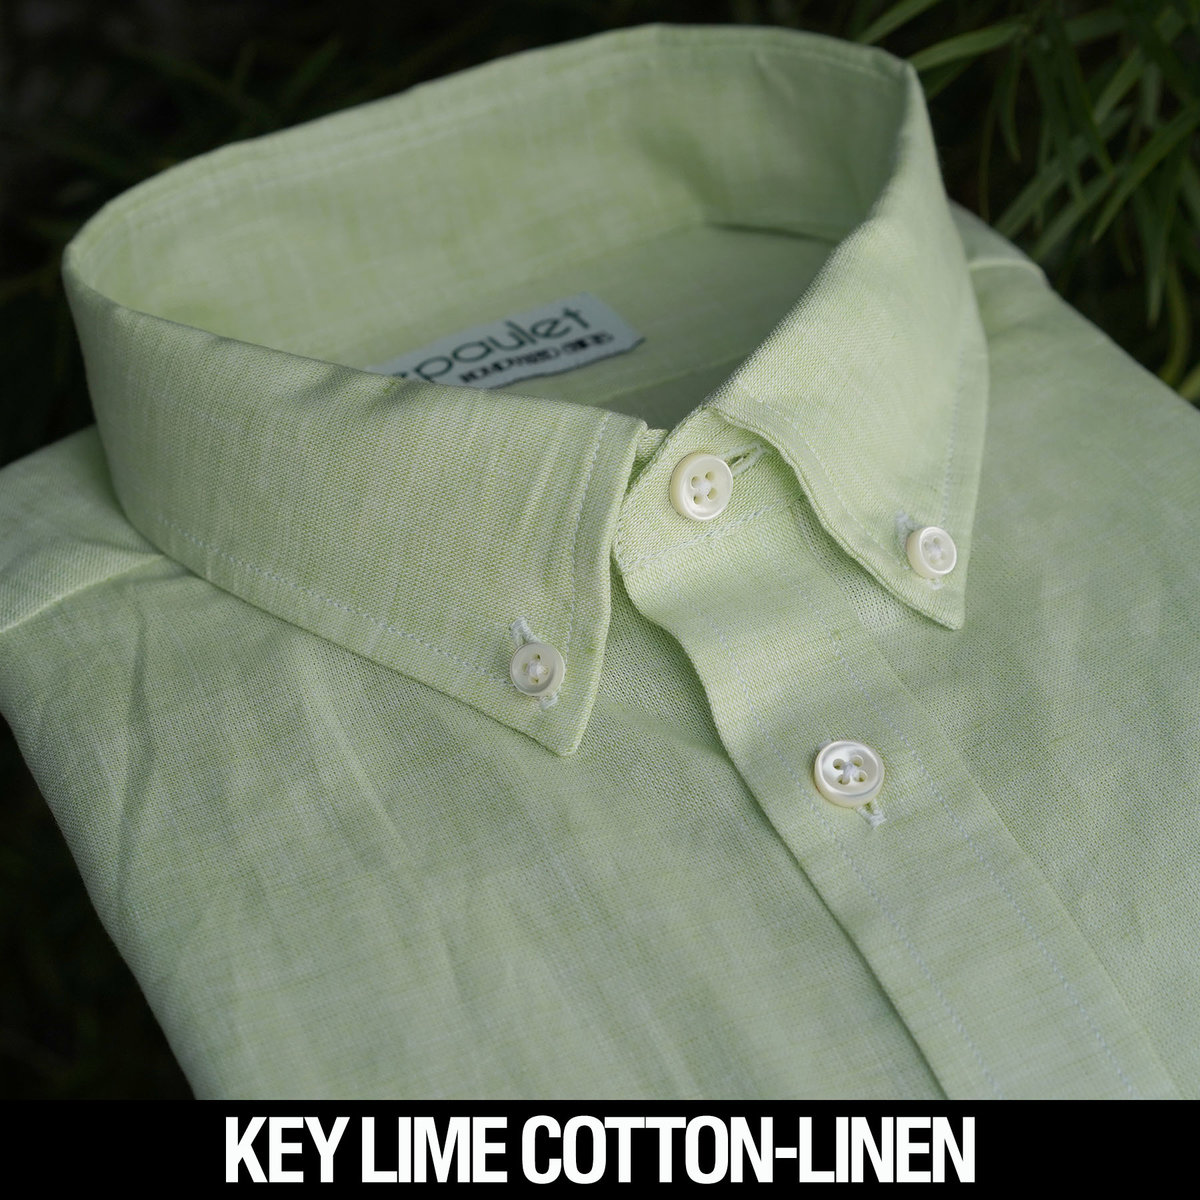 Key Lime Cotton Linen.jpg